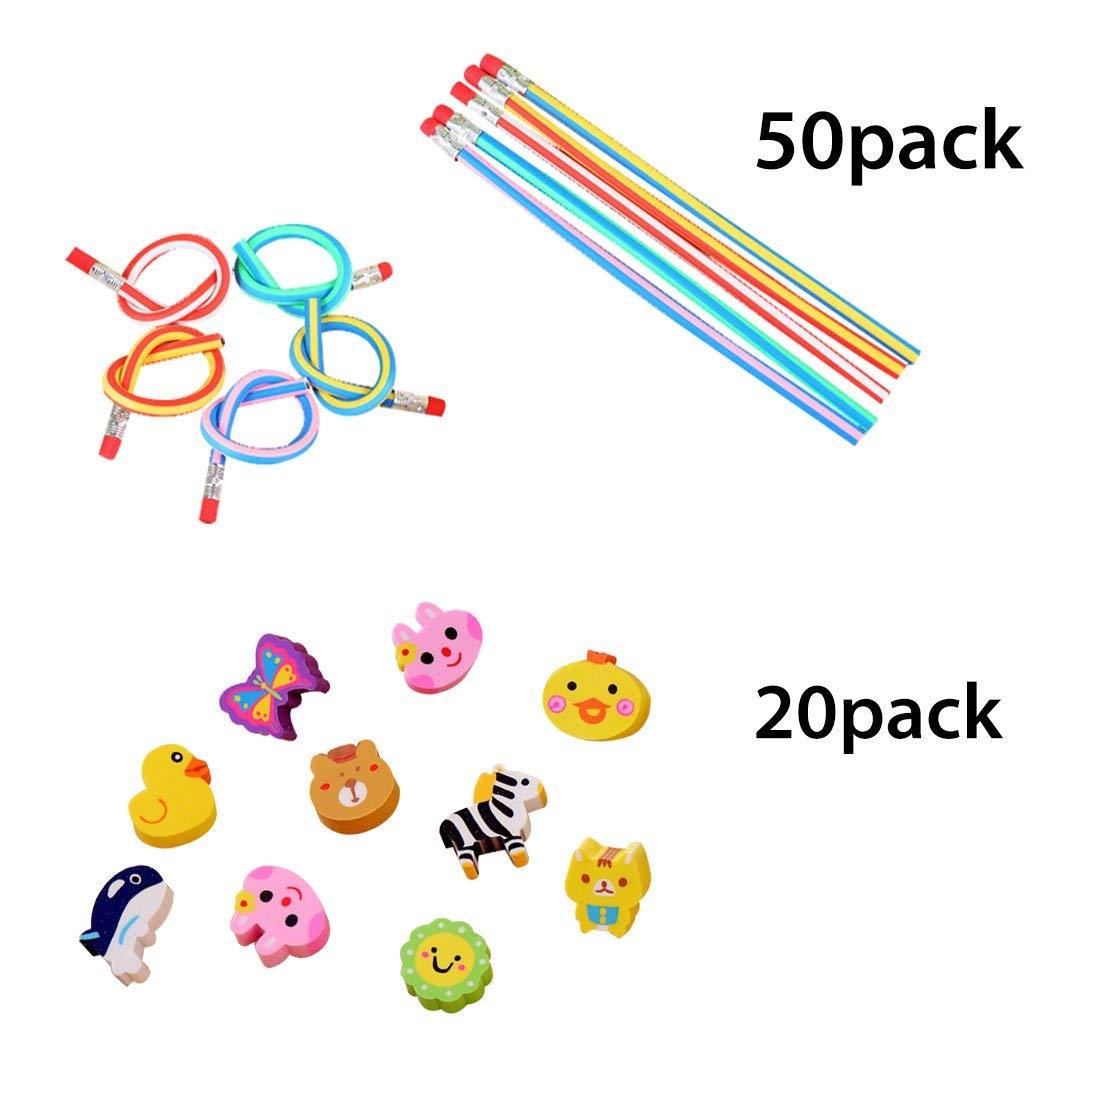 iSuperb 50 pieces Pencils and 20 pieces Cute Cartoon Eraser Colorful Soft Flexible Bendy Pencils for Kids (Pencil& eraser)